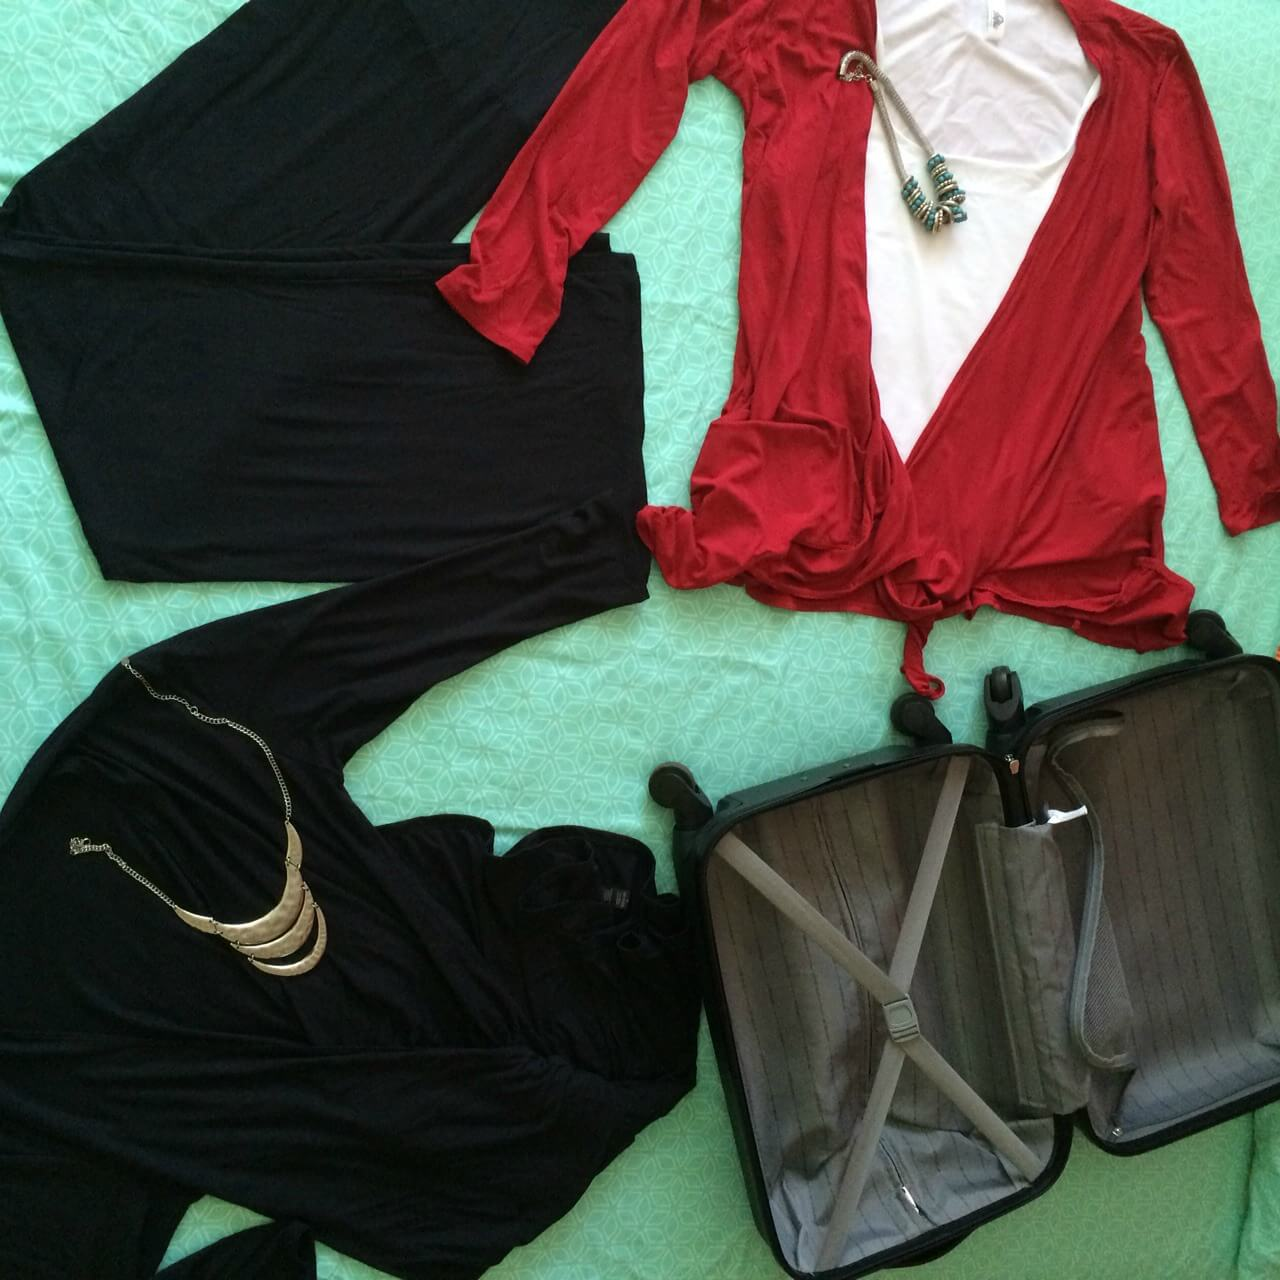 Intimo travel wardrobe